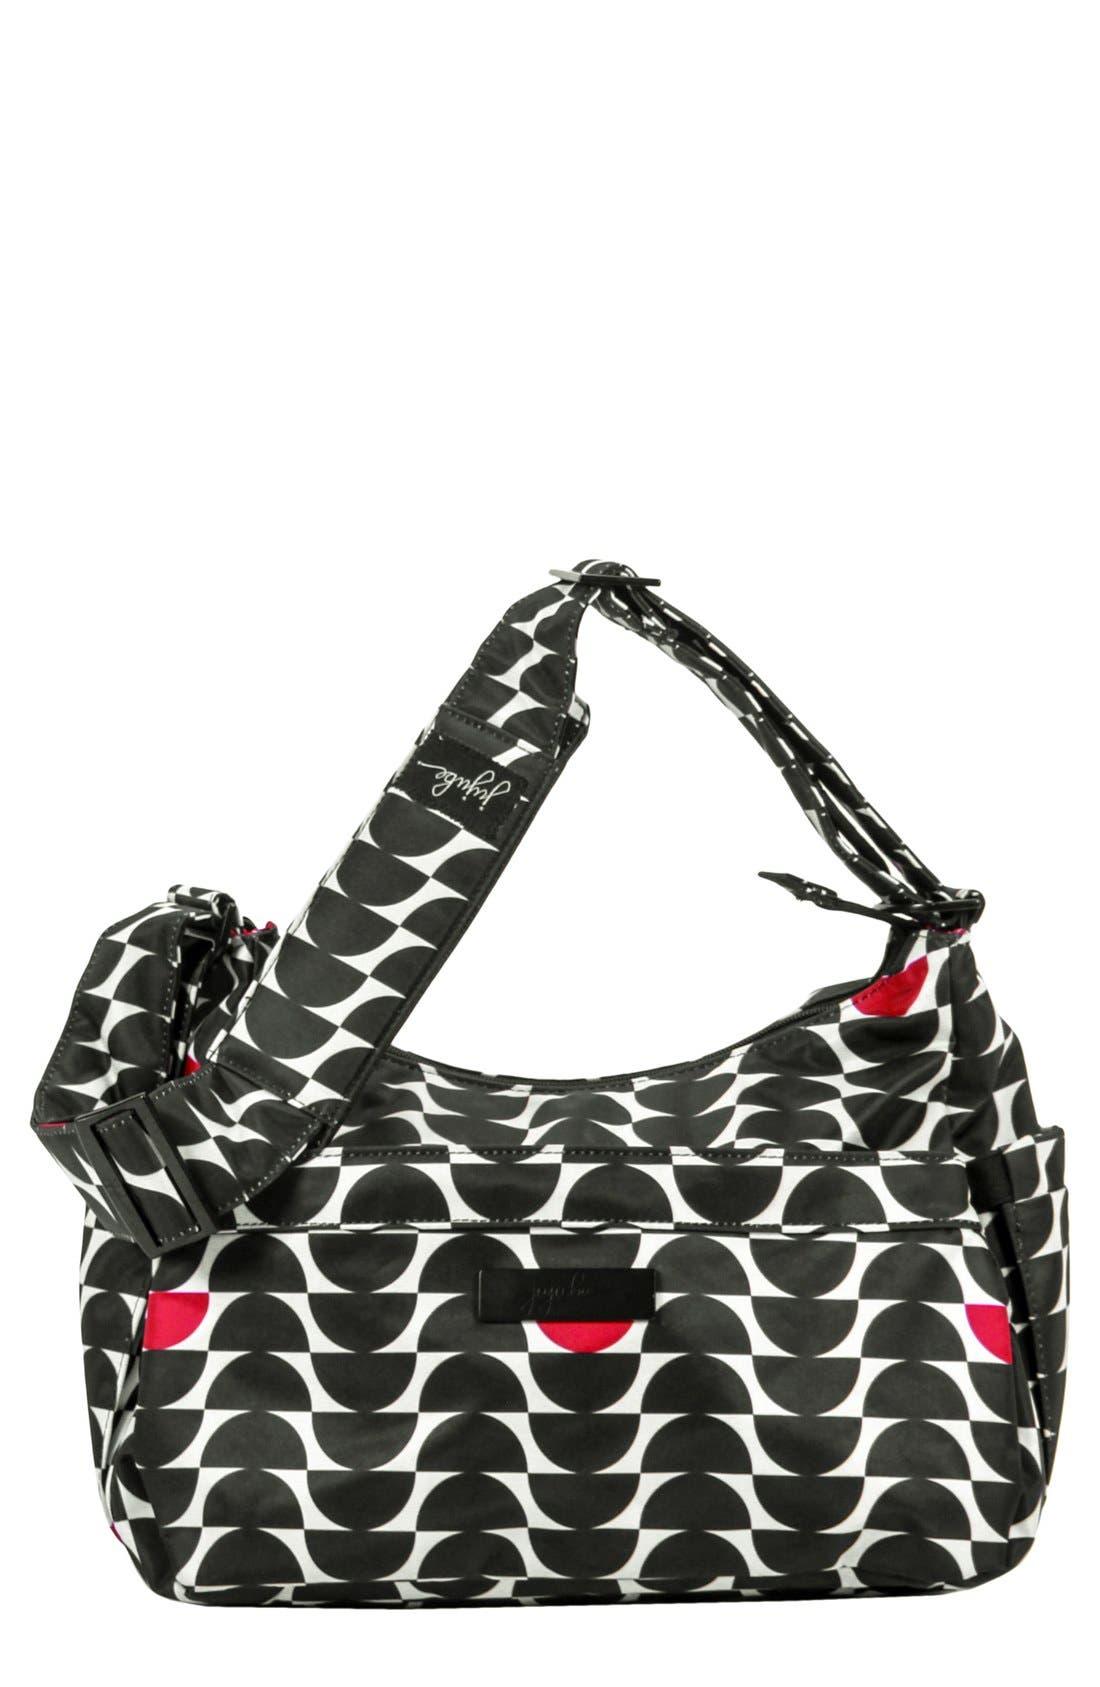 'HoboBe' Diaper Bag,                             Main thumbnail 1, color,                             Black Widow